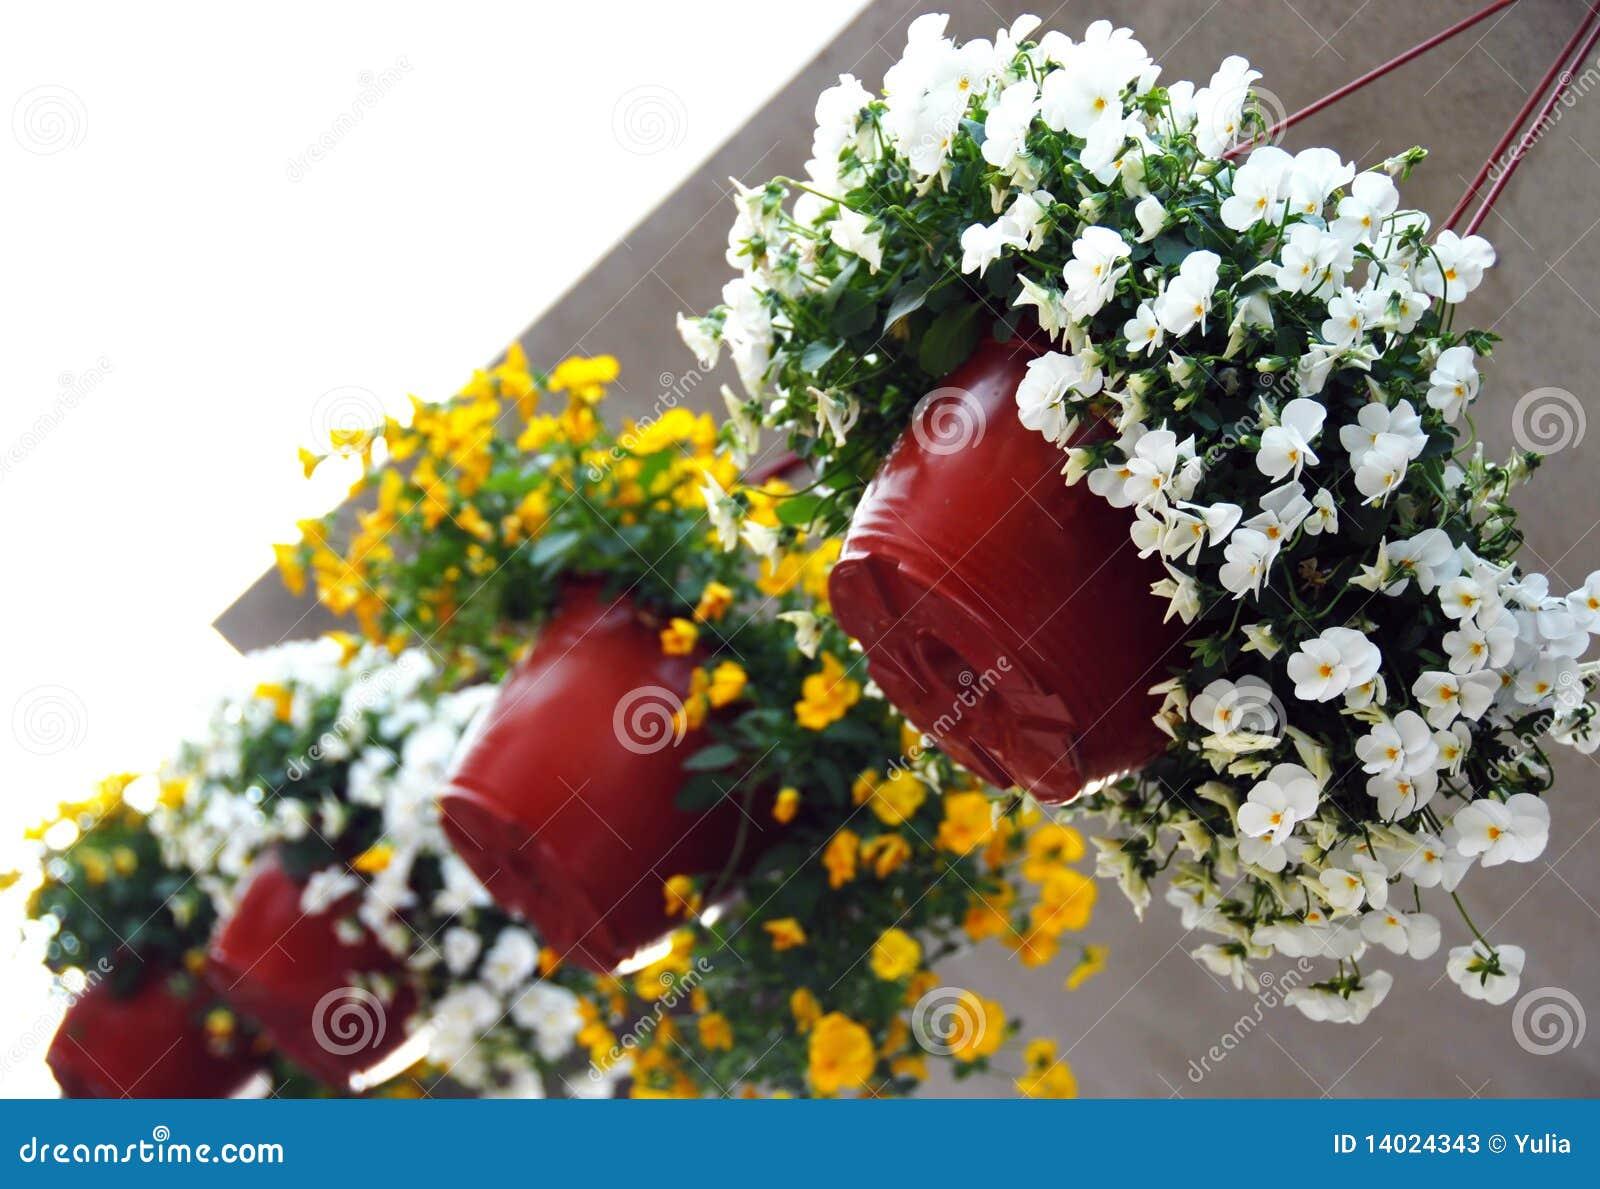 Hanging flowerpots with viola